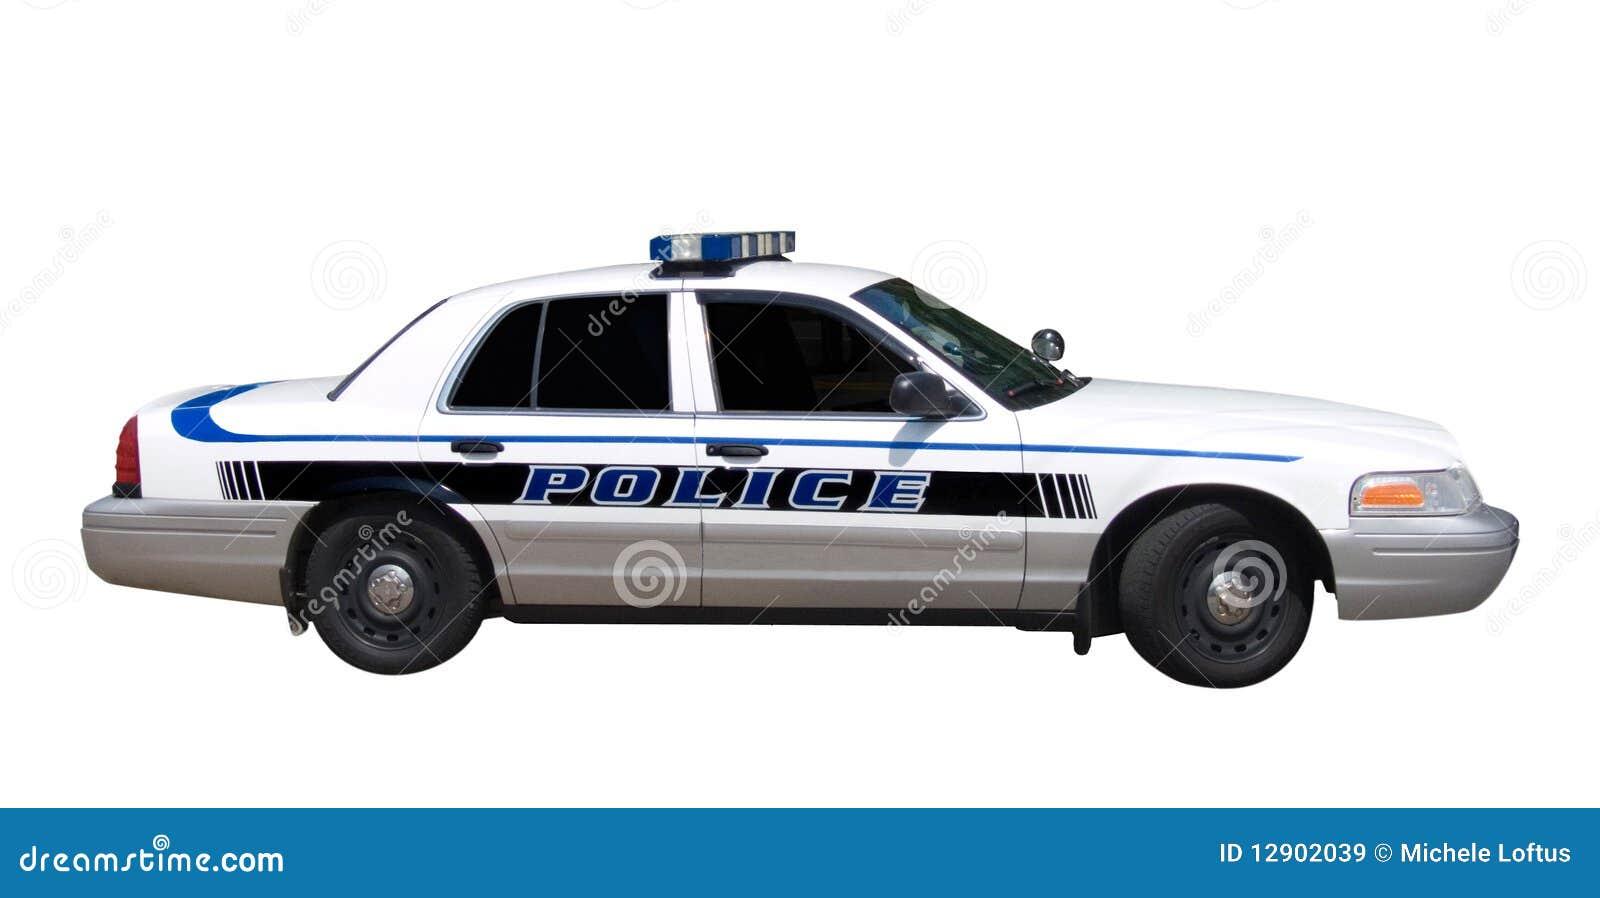 Pics photos police background police background police background - Gallery For Gt Police Car Background